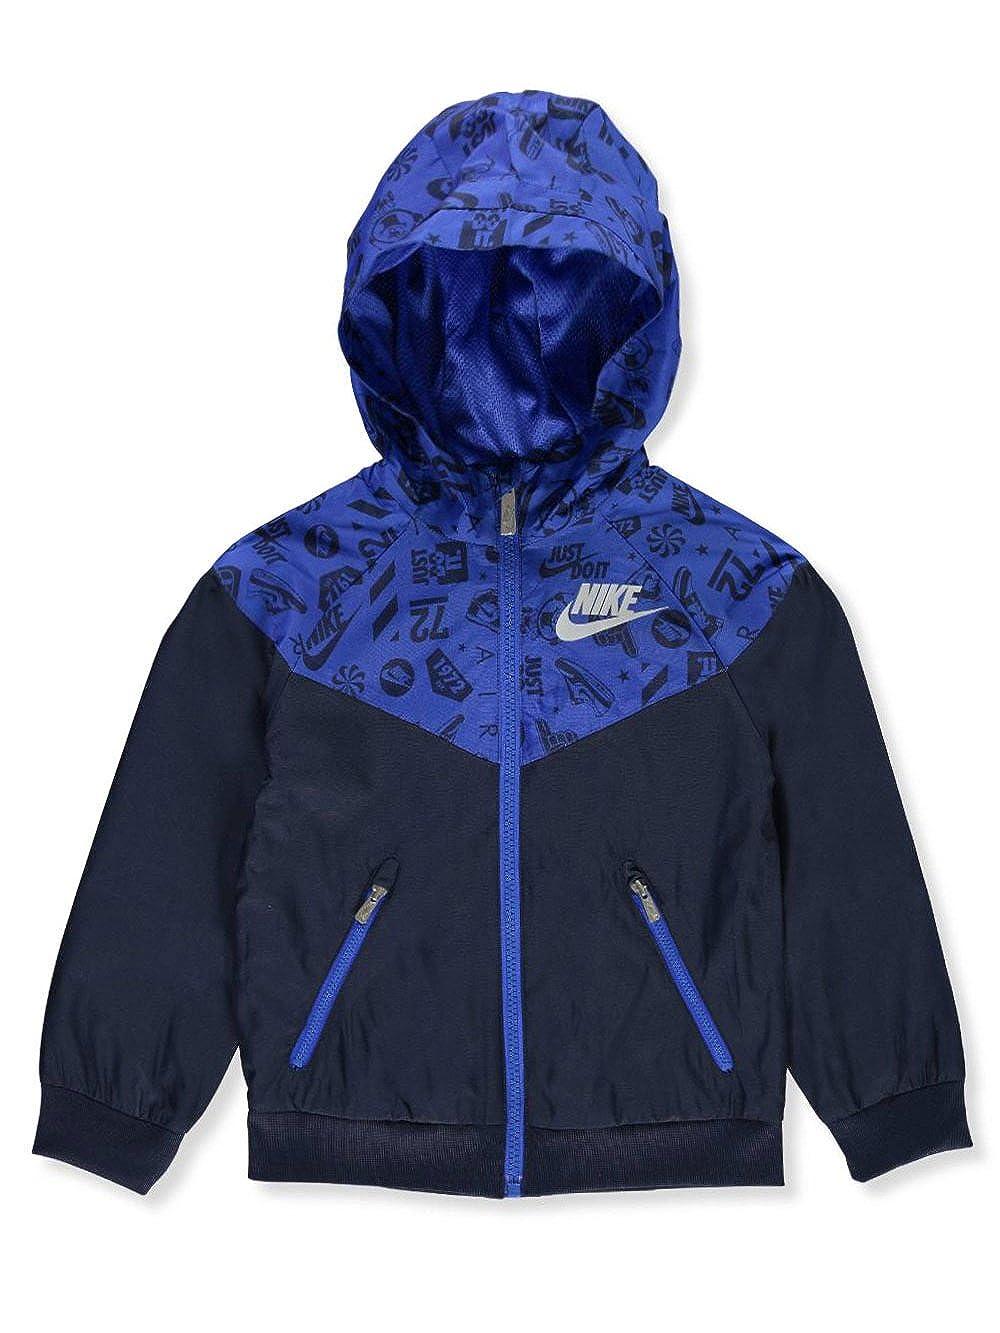 fccbe22a9973 Amazon.com  Nike Boys  Hooded Windbreaker Jacket - Obsidian